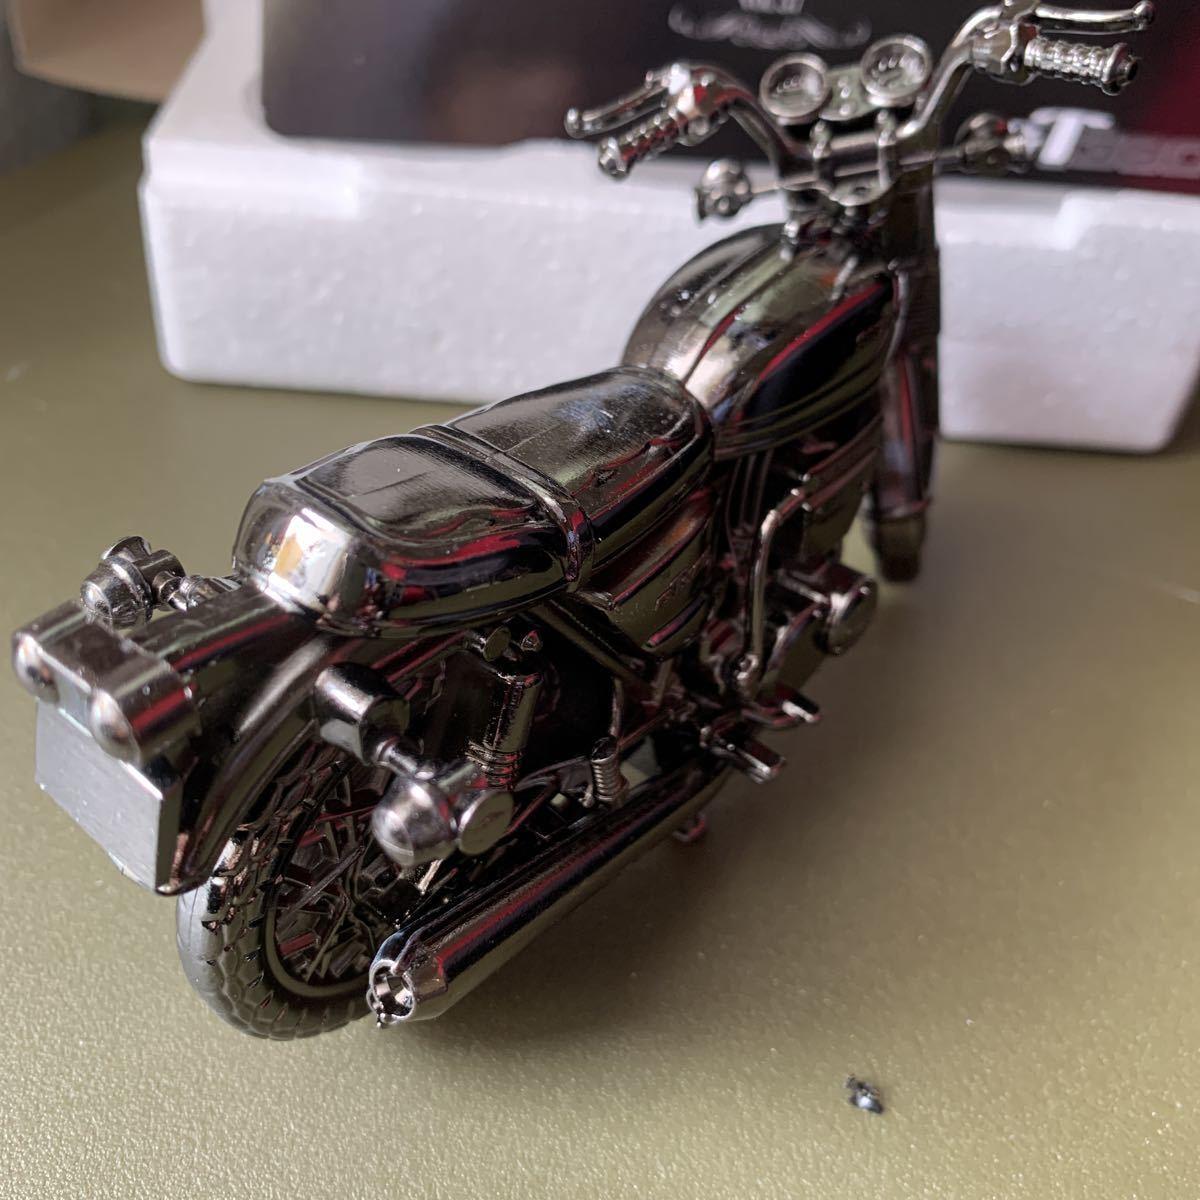 K_DSC0054 世界の名車シリーズ vol.37 SUZUKI GT380 レッドバロン ミニレプリカ バイクのインテリアミニカー_画像6